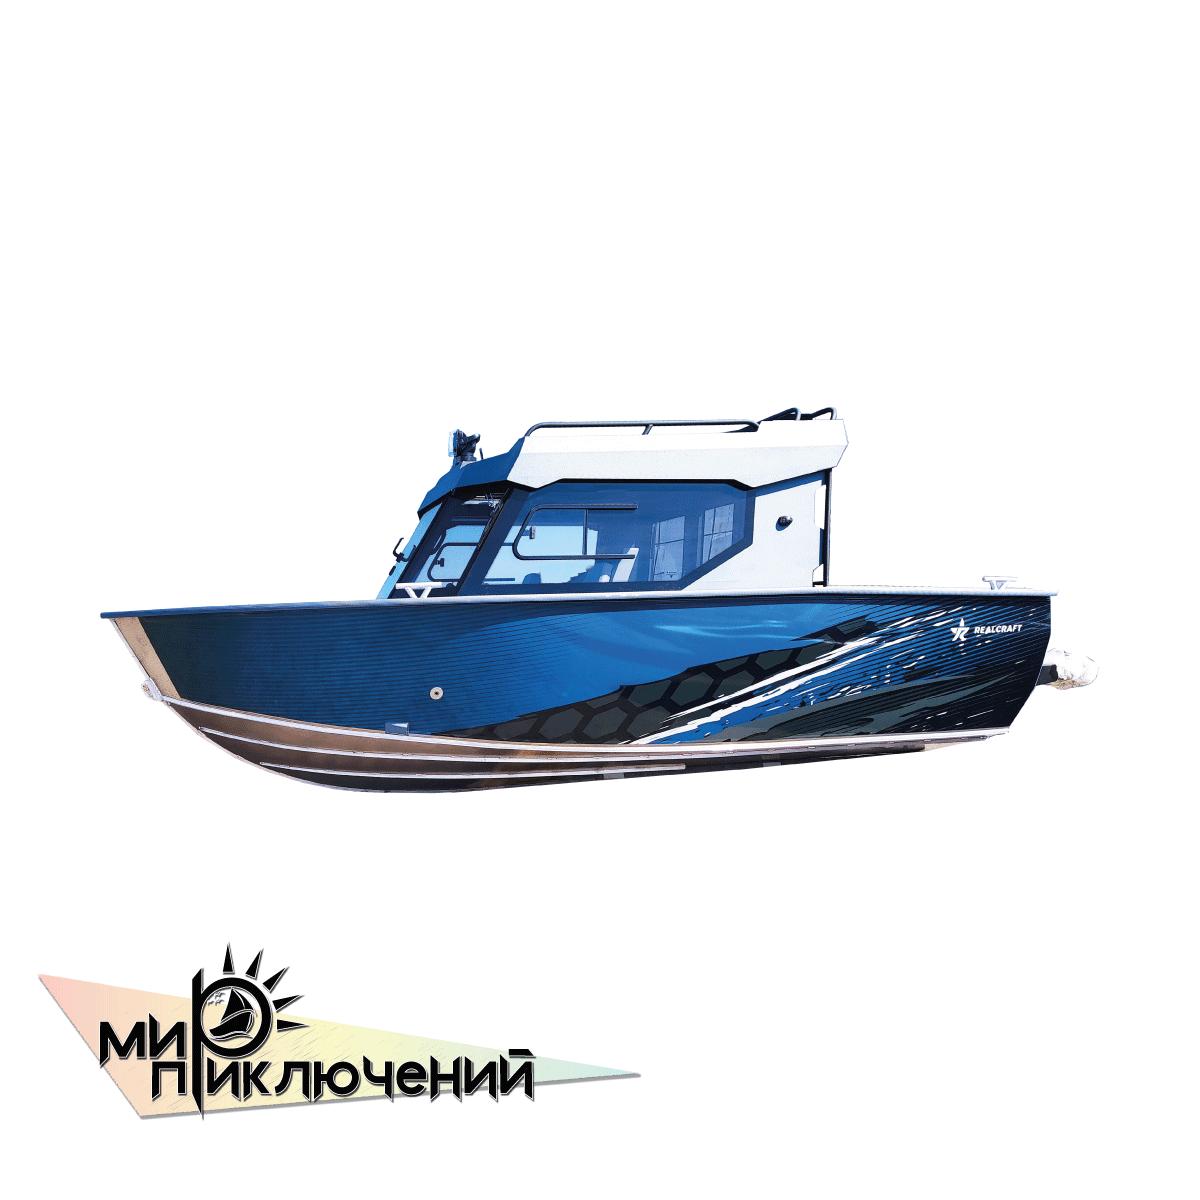 Моторная лодка RealCraft   600  Cabin